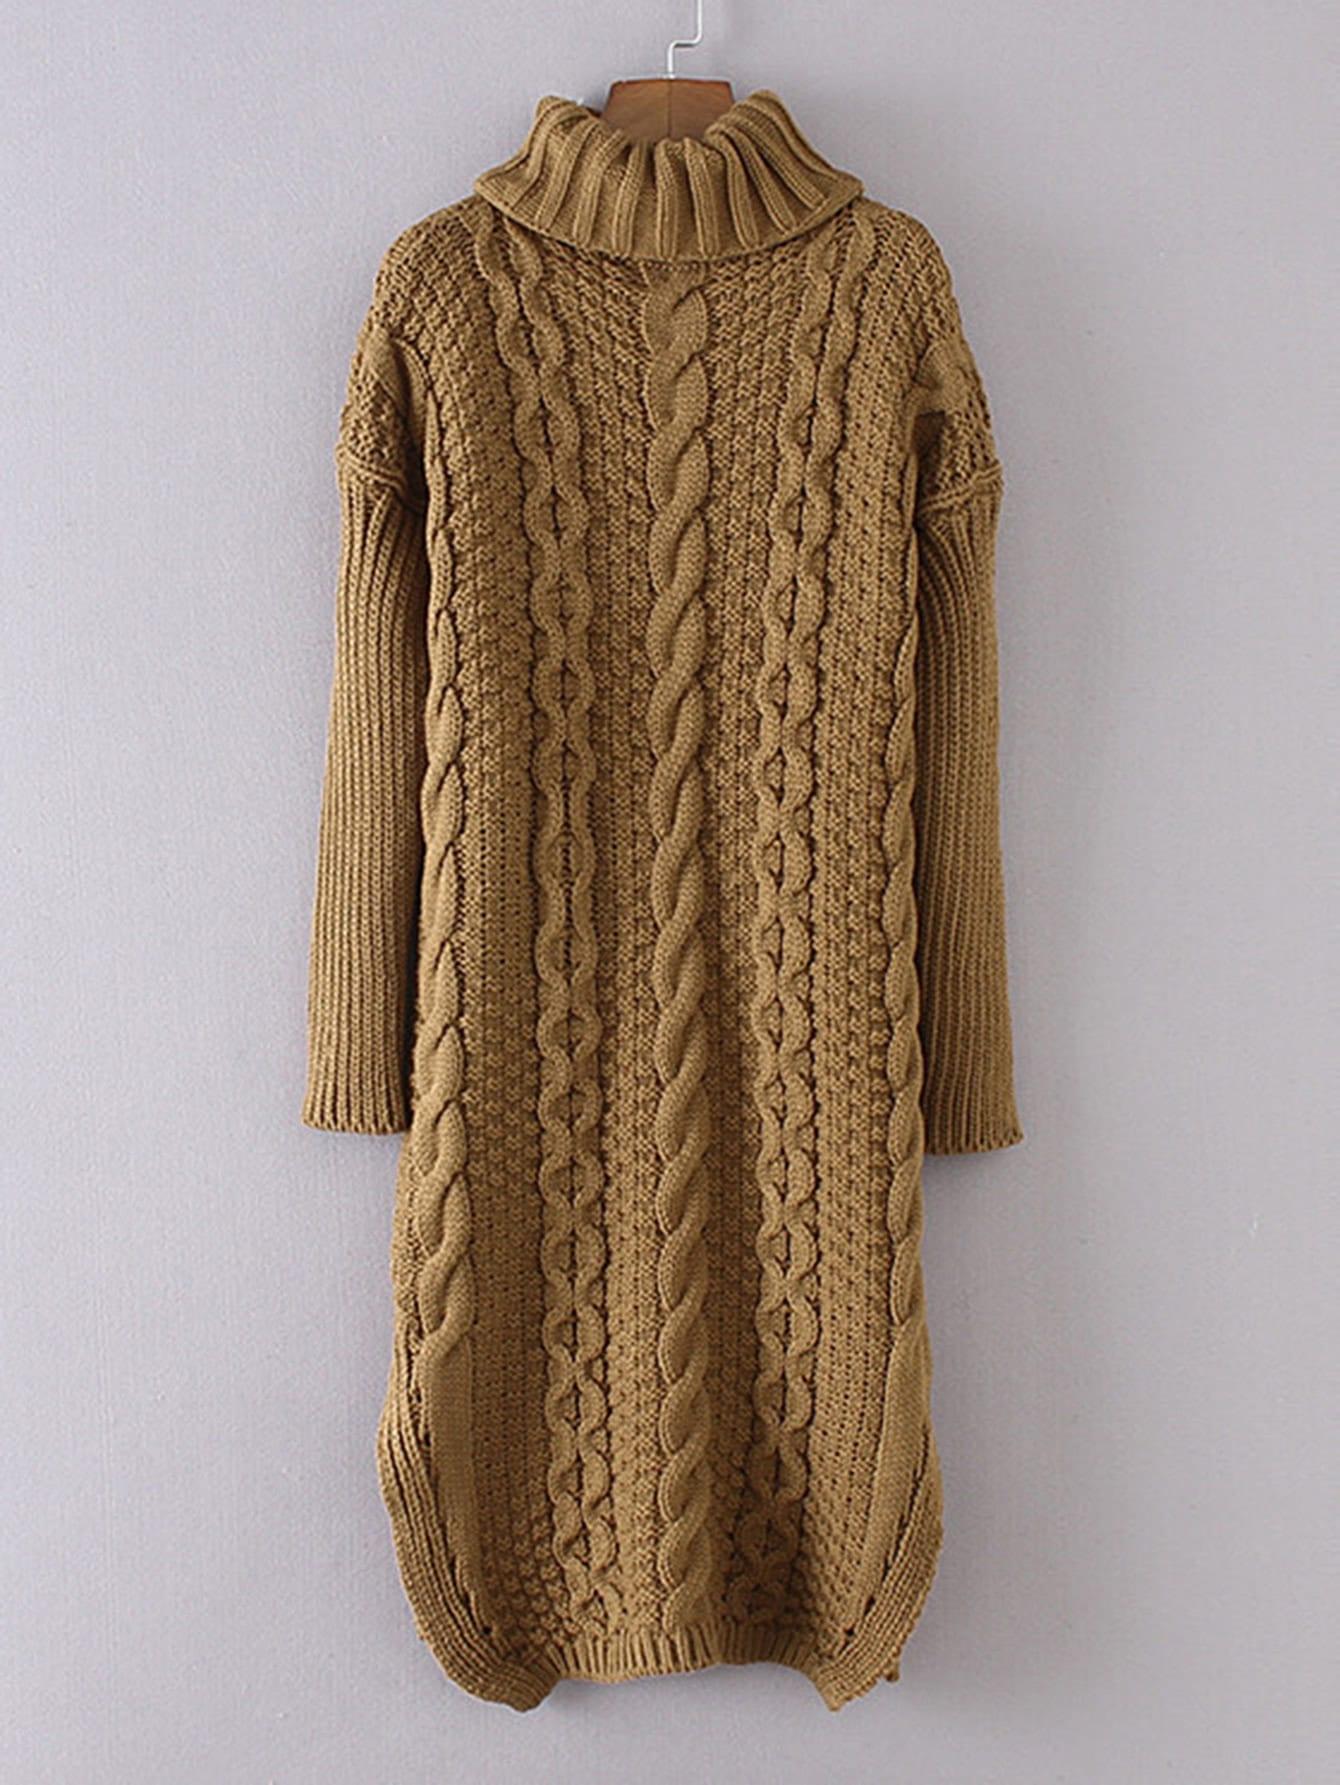 Cable-knit Turtleneck Sweater Dress -SheIn(Sheinside)